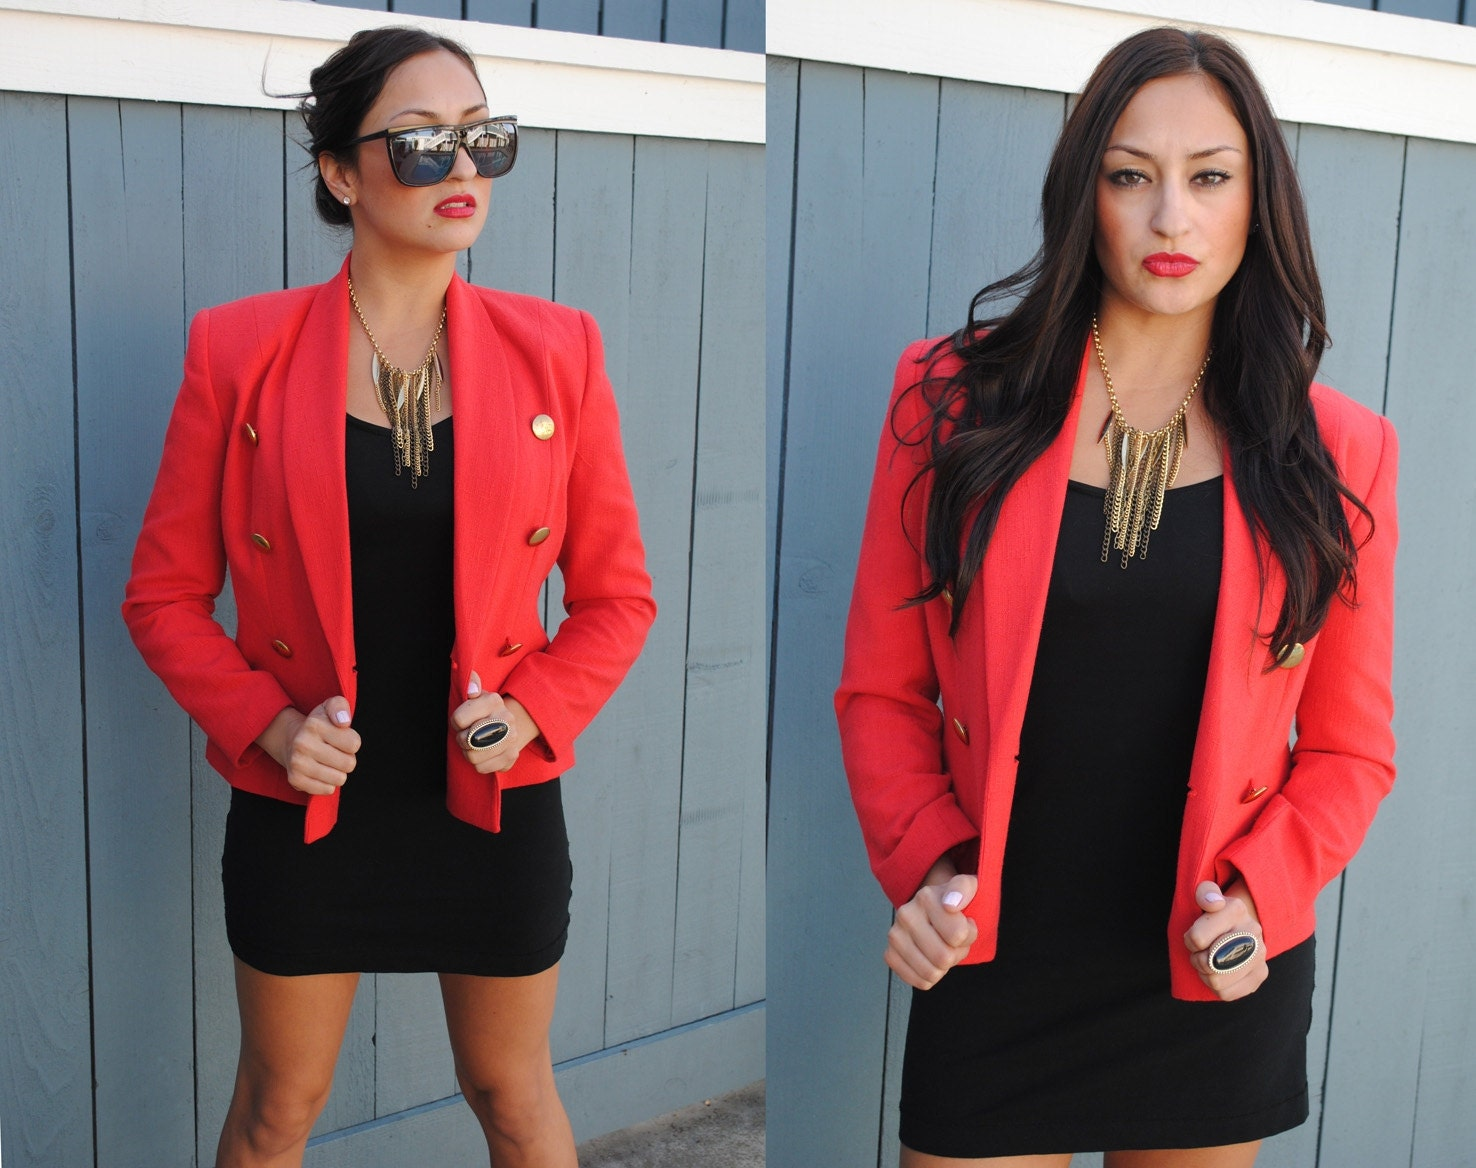 Vintage Bold Eighties-Nineties  Apple Red Blazer Jacket with Gold Button Detailing, Karen Scott